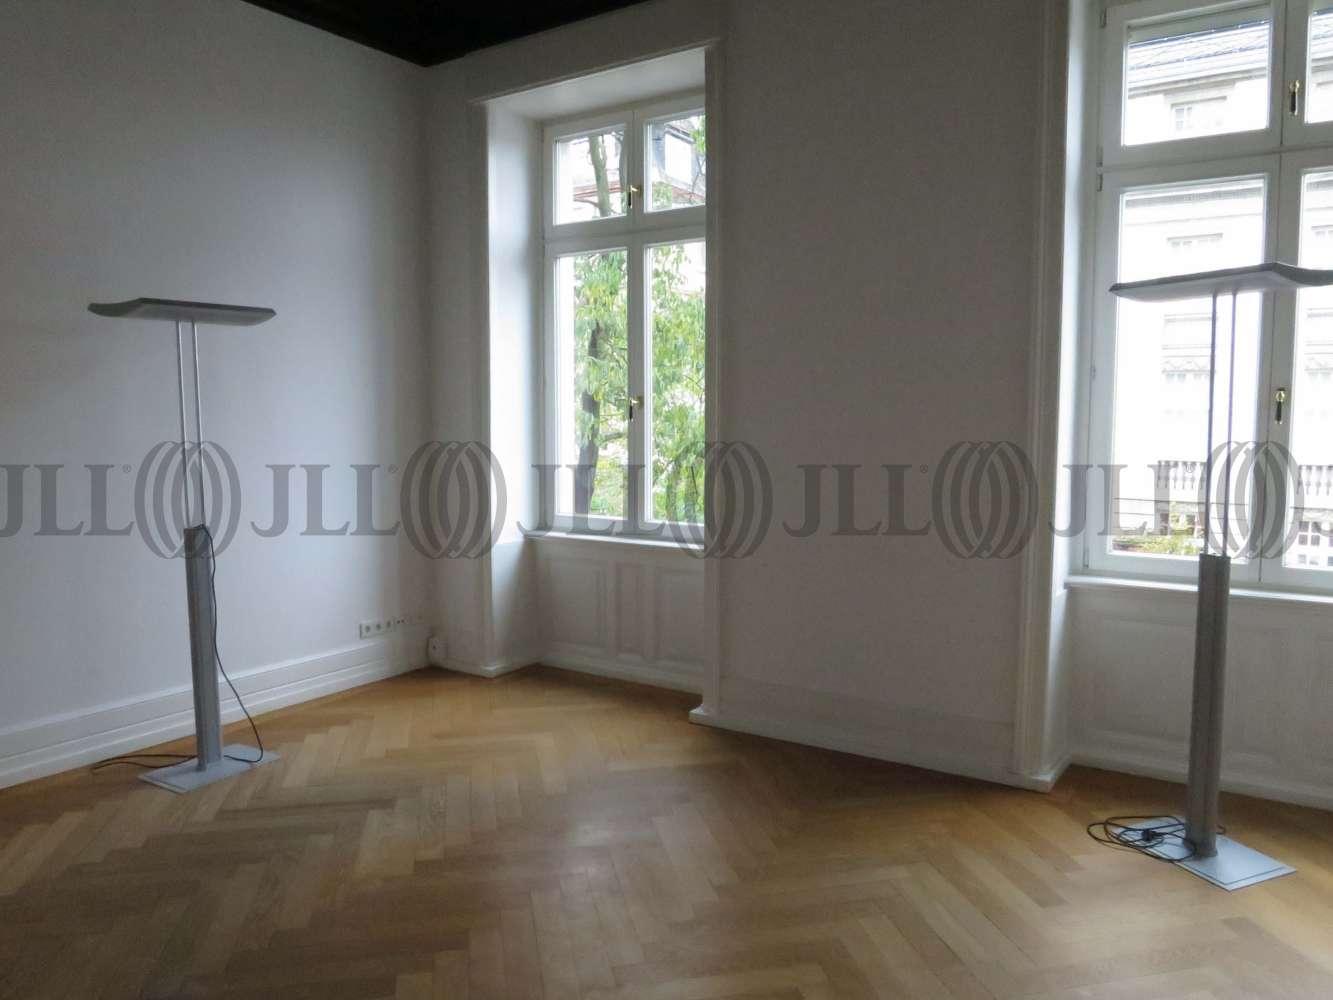 Büros Frankfurt am main, 60594 - Büro - Frankfurt am Main, Sachsenhausen - F2643 - 10903929